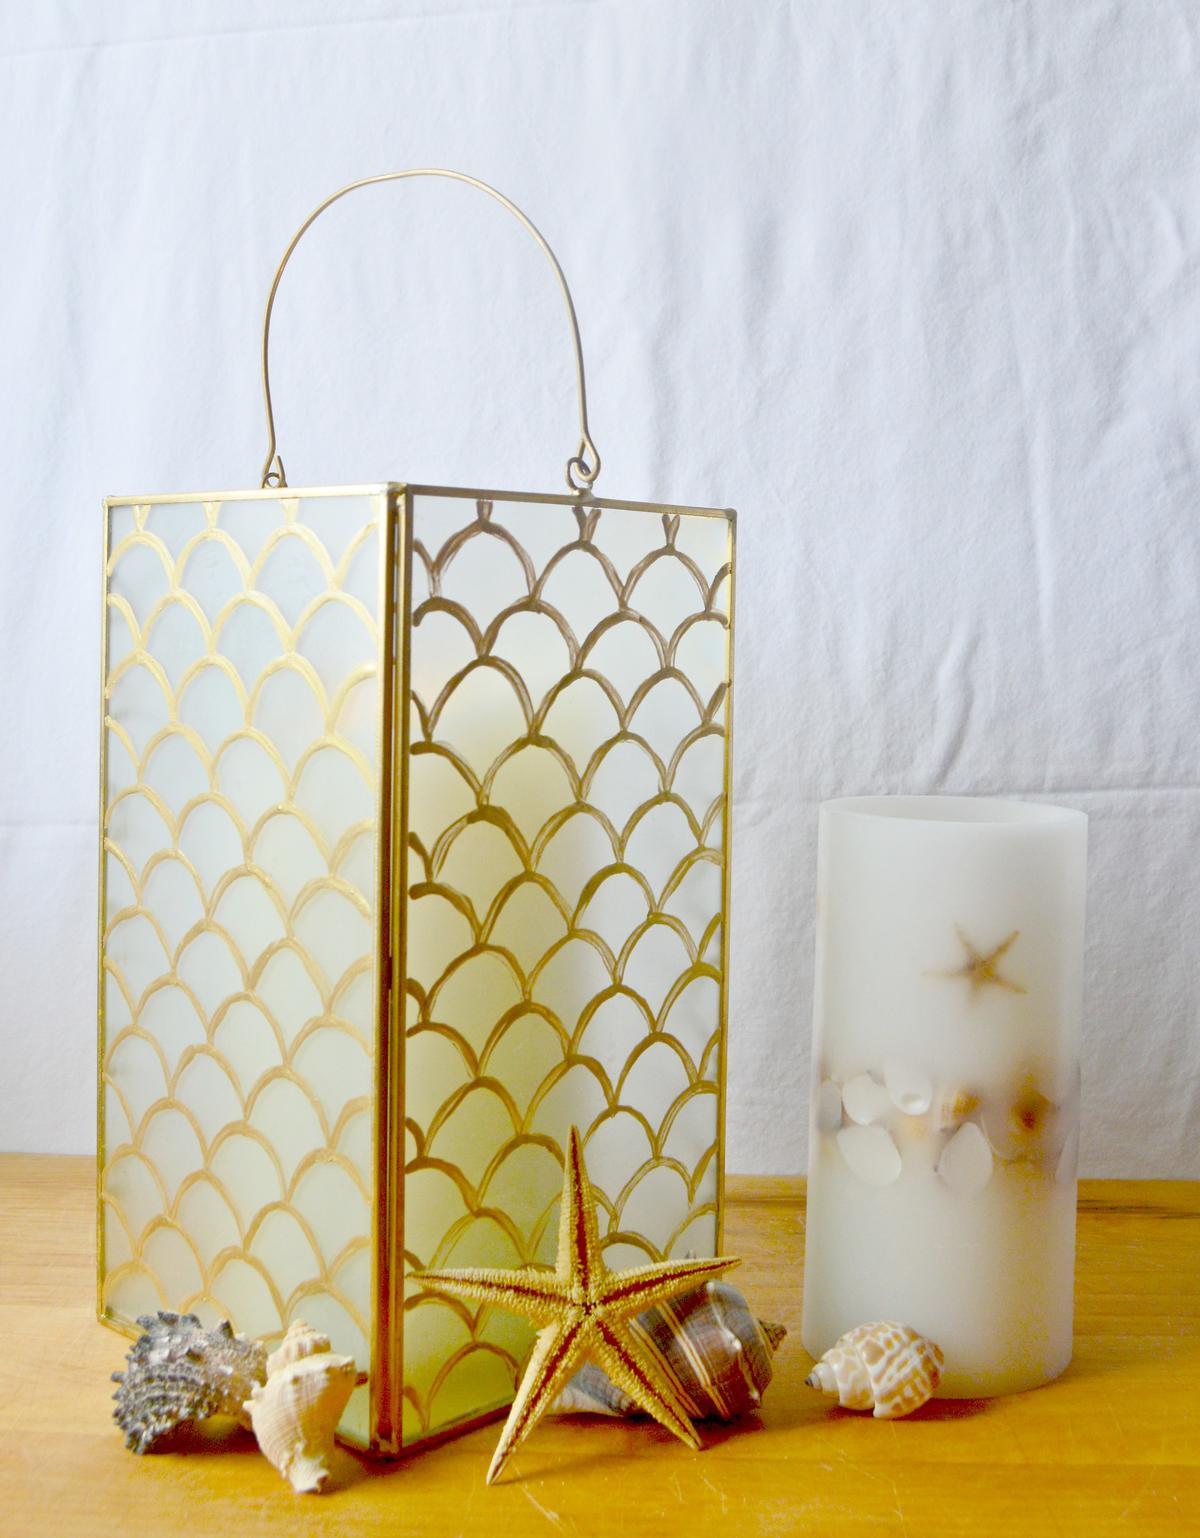 DIY Home Decor How To Make A Pottery Barn Inspired Capiz Lantern By Samantha Aleman